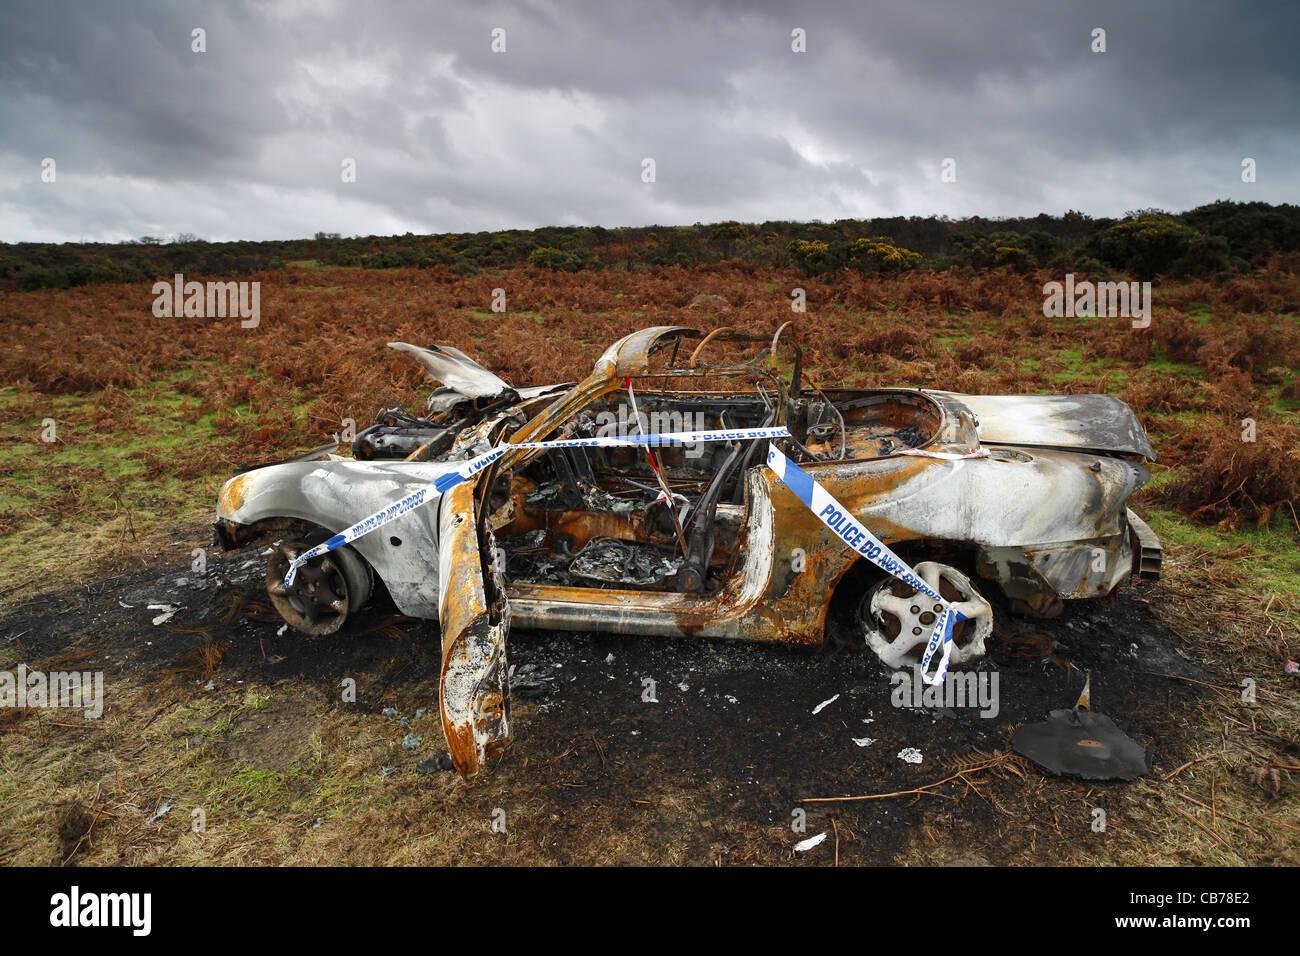 A burnt out Mazda MX5 on Dartmoor in Devon, UK. - Stock Image